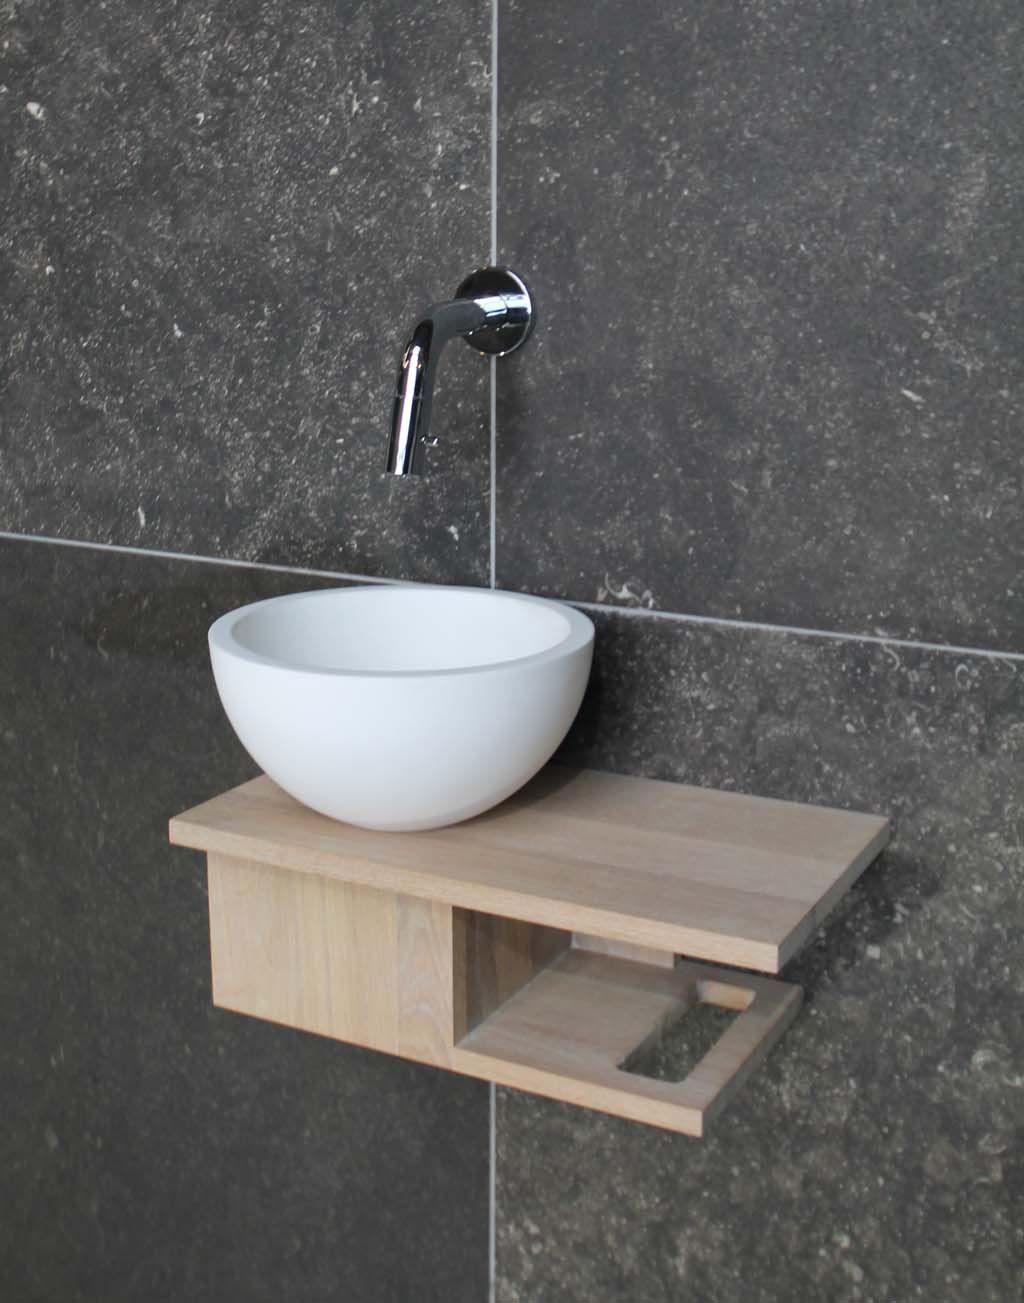 Favoriete LucaWood fonteinmeubel | bathroom in 2019 - Badkamer, Toiletruimte YT51